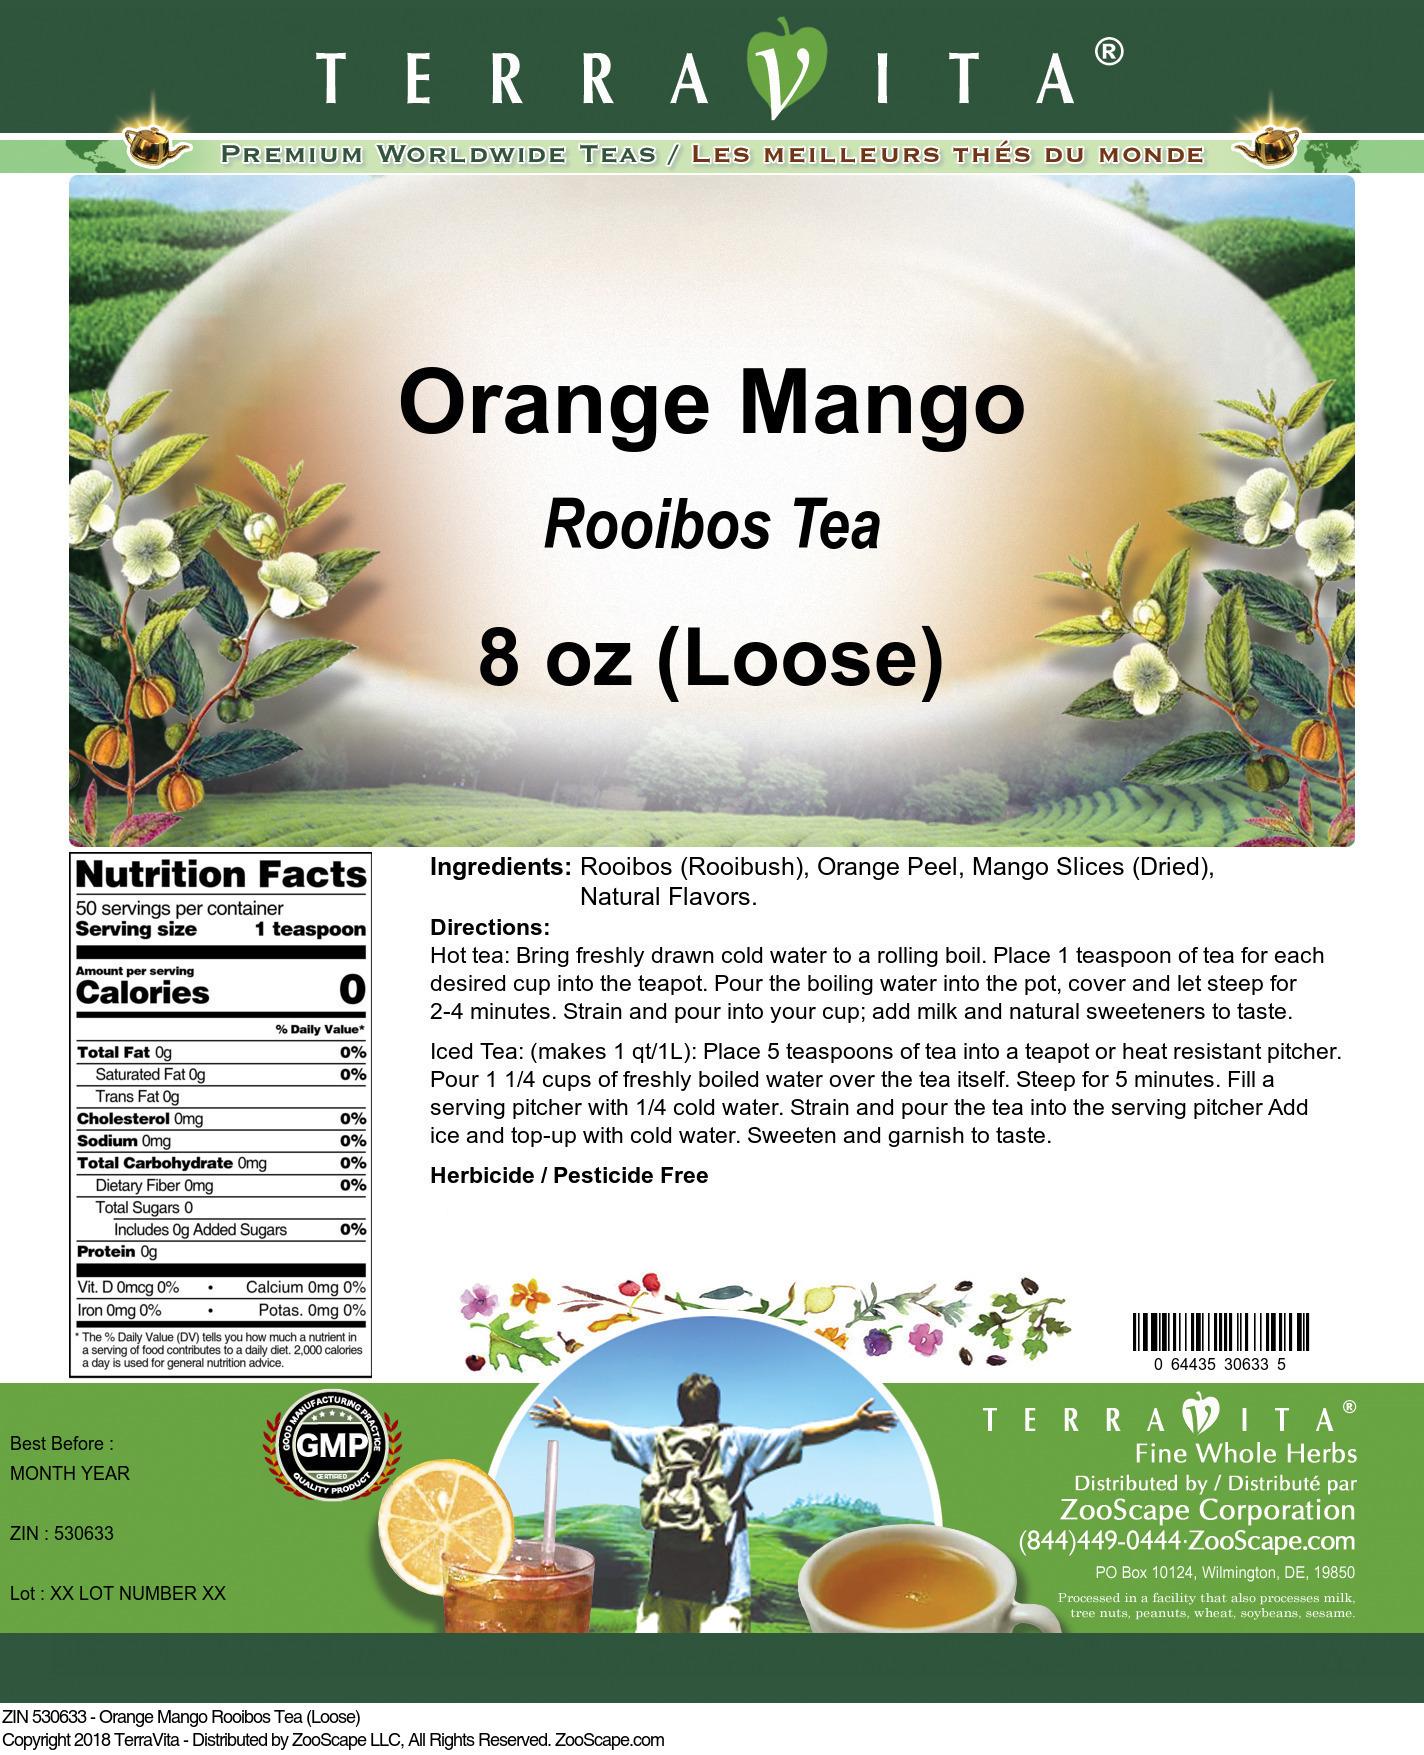 Orange Mango Rooibos Tea (Loose)